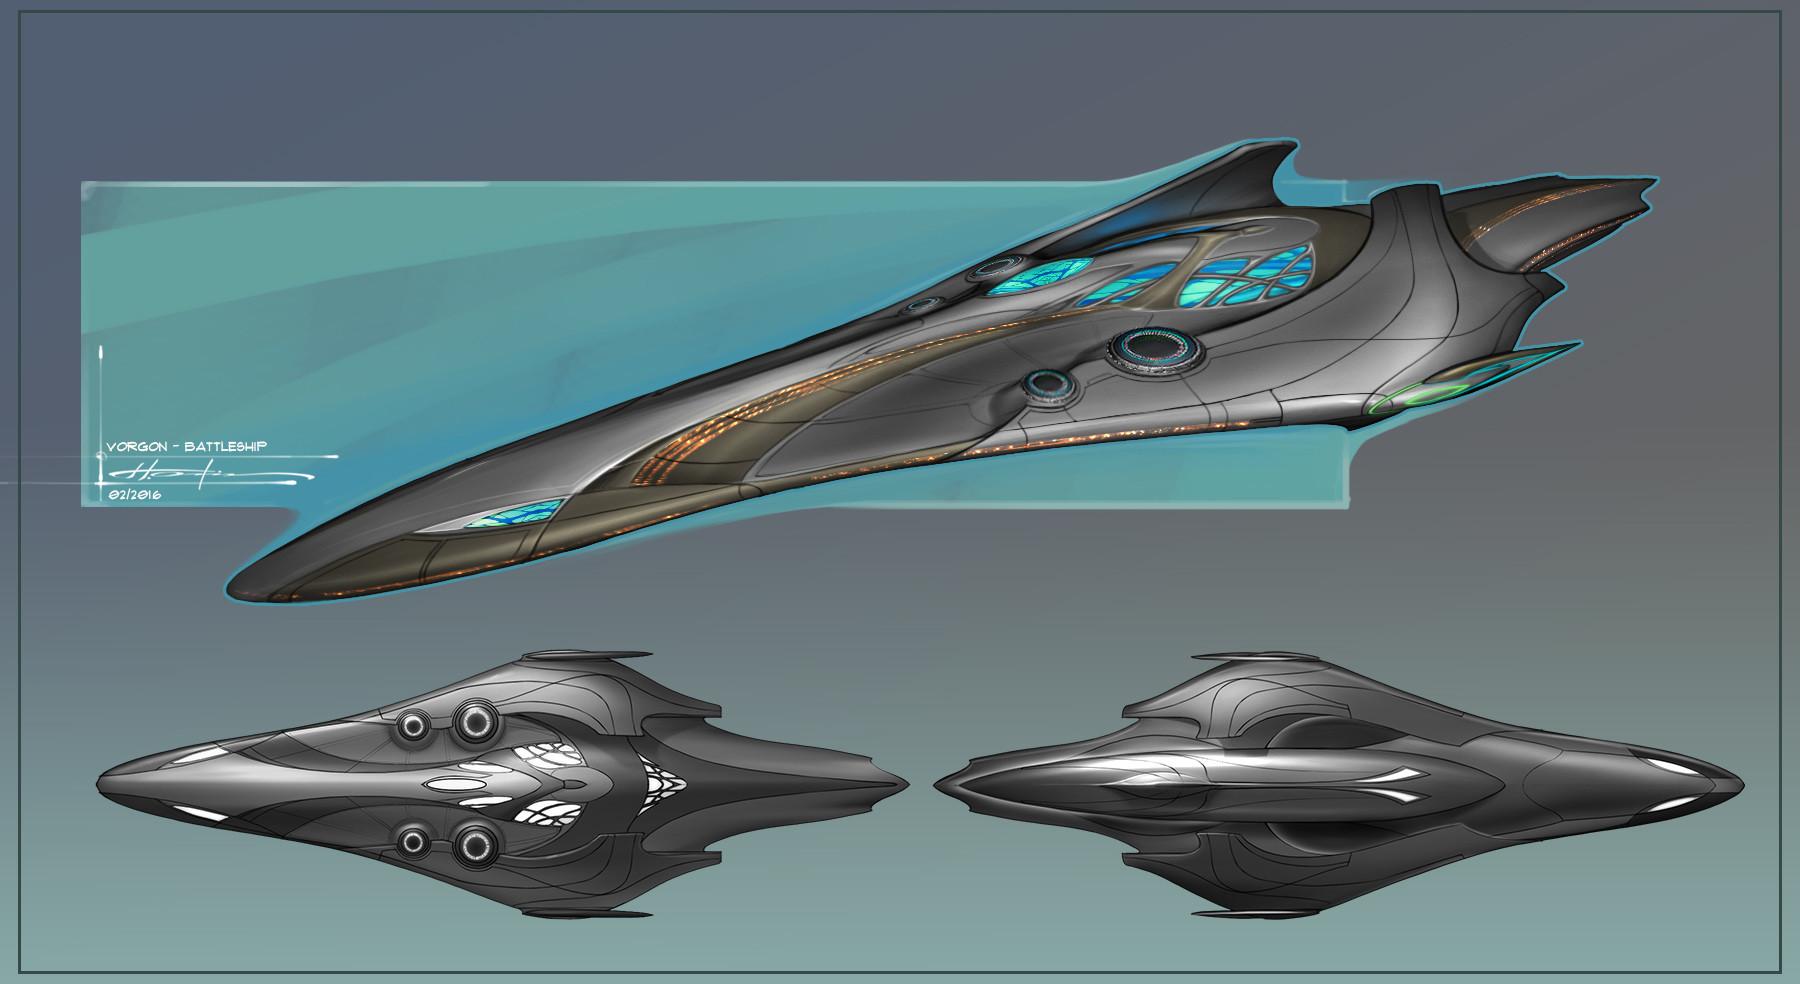 Hector ortiz vorgon battleship